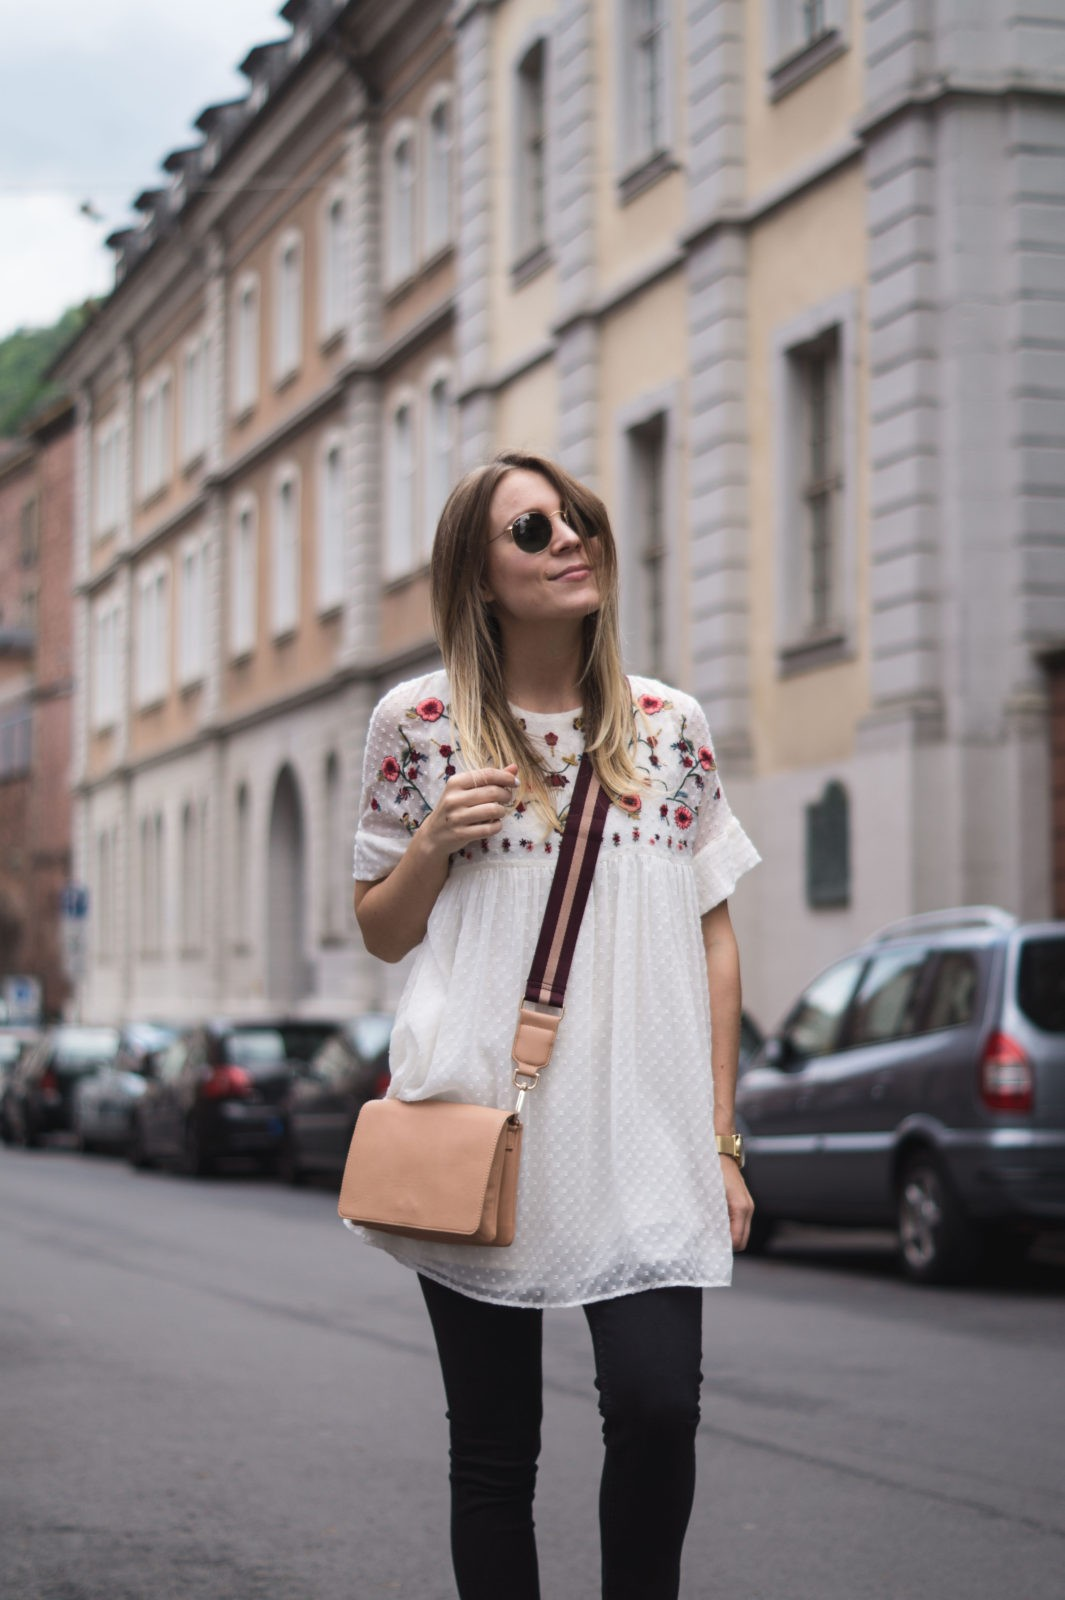 Floral Summer Dress Zara Jumpsuit Black Loafers Pantoletten Sommerkleid Streetstyle Heidelberg Sariety Modeblog Streetstyle